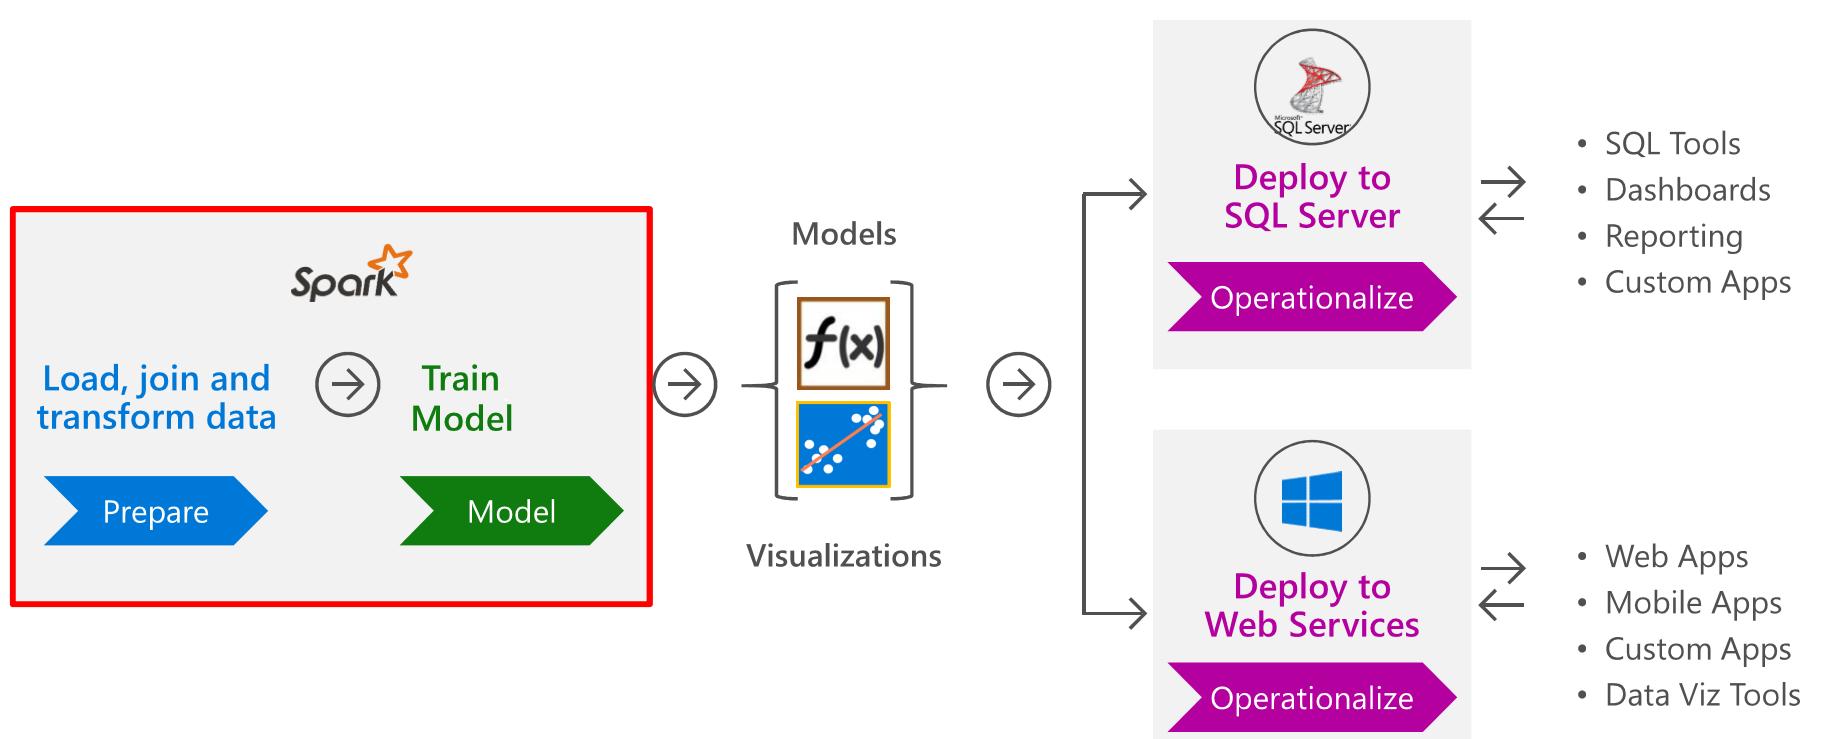 develop-in-spark-deploy-to-sql-server-or-web-services